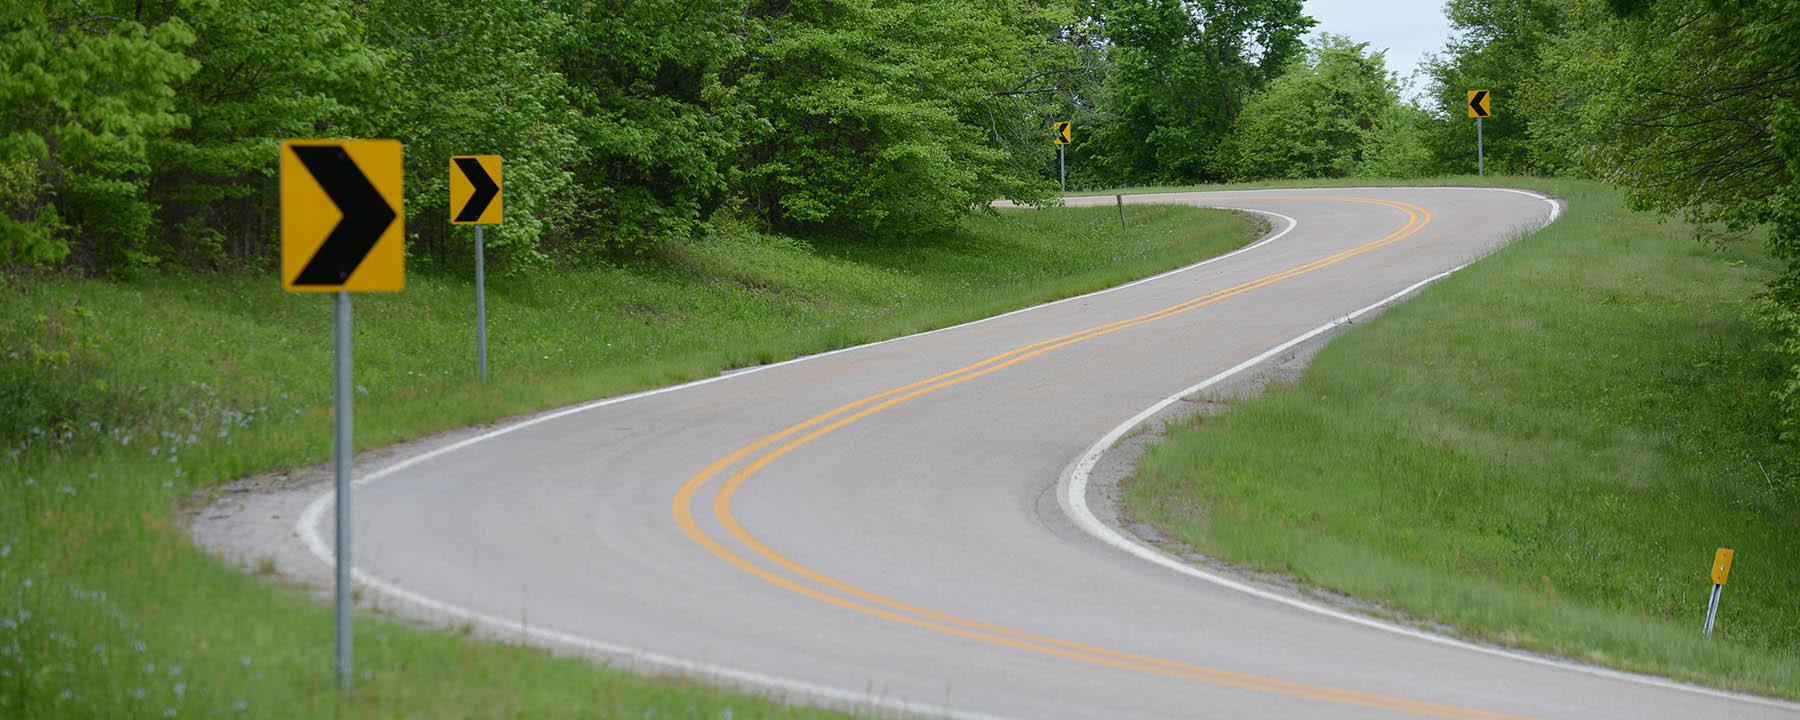 Arkansas-Good-Roads-Foundation-Image-News-Reviews